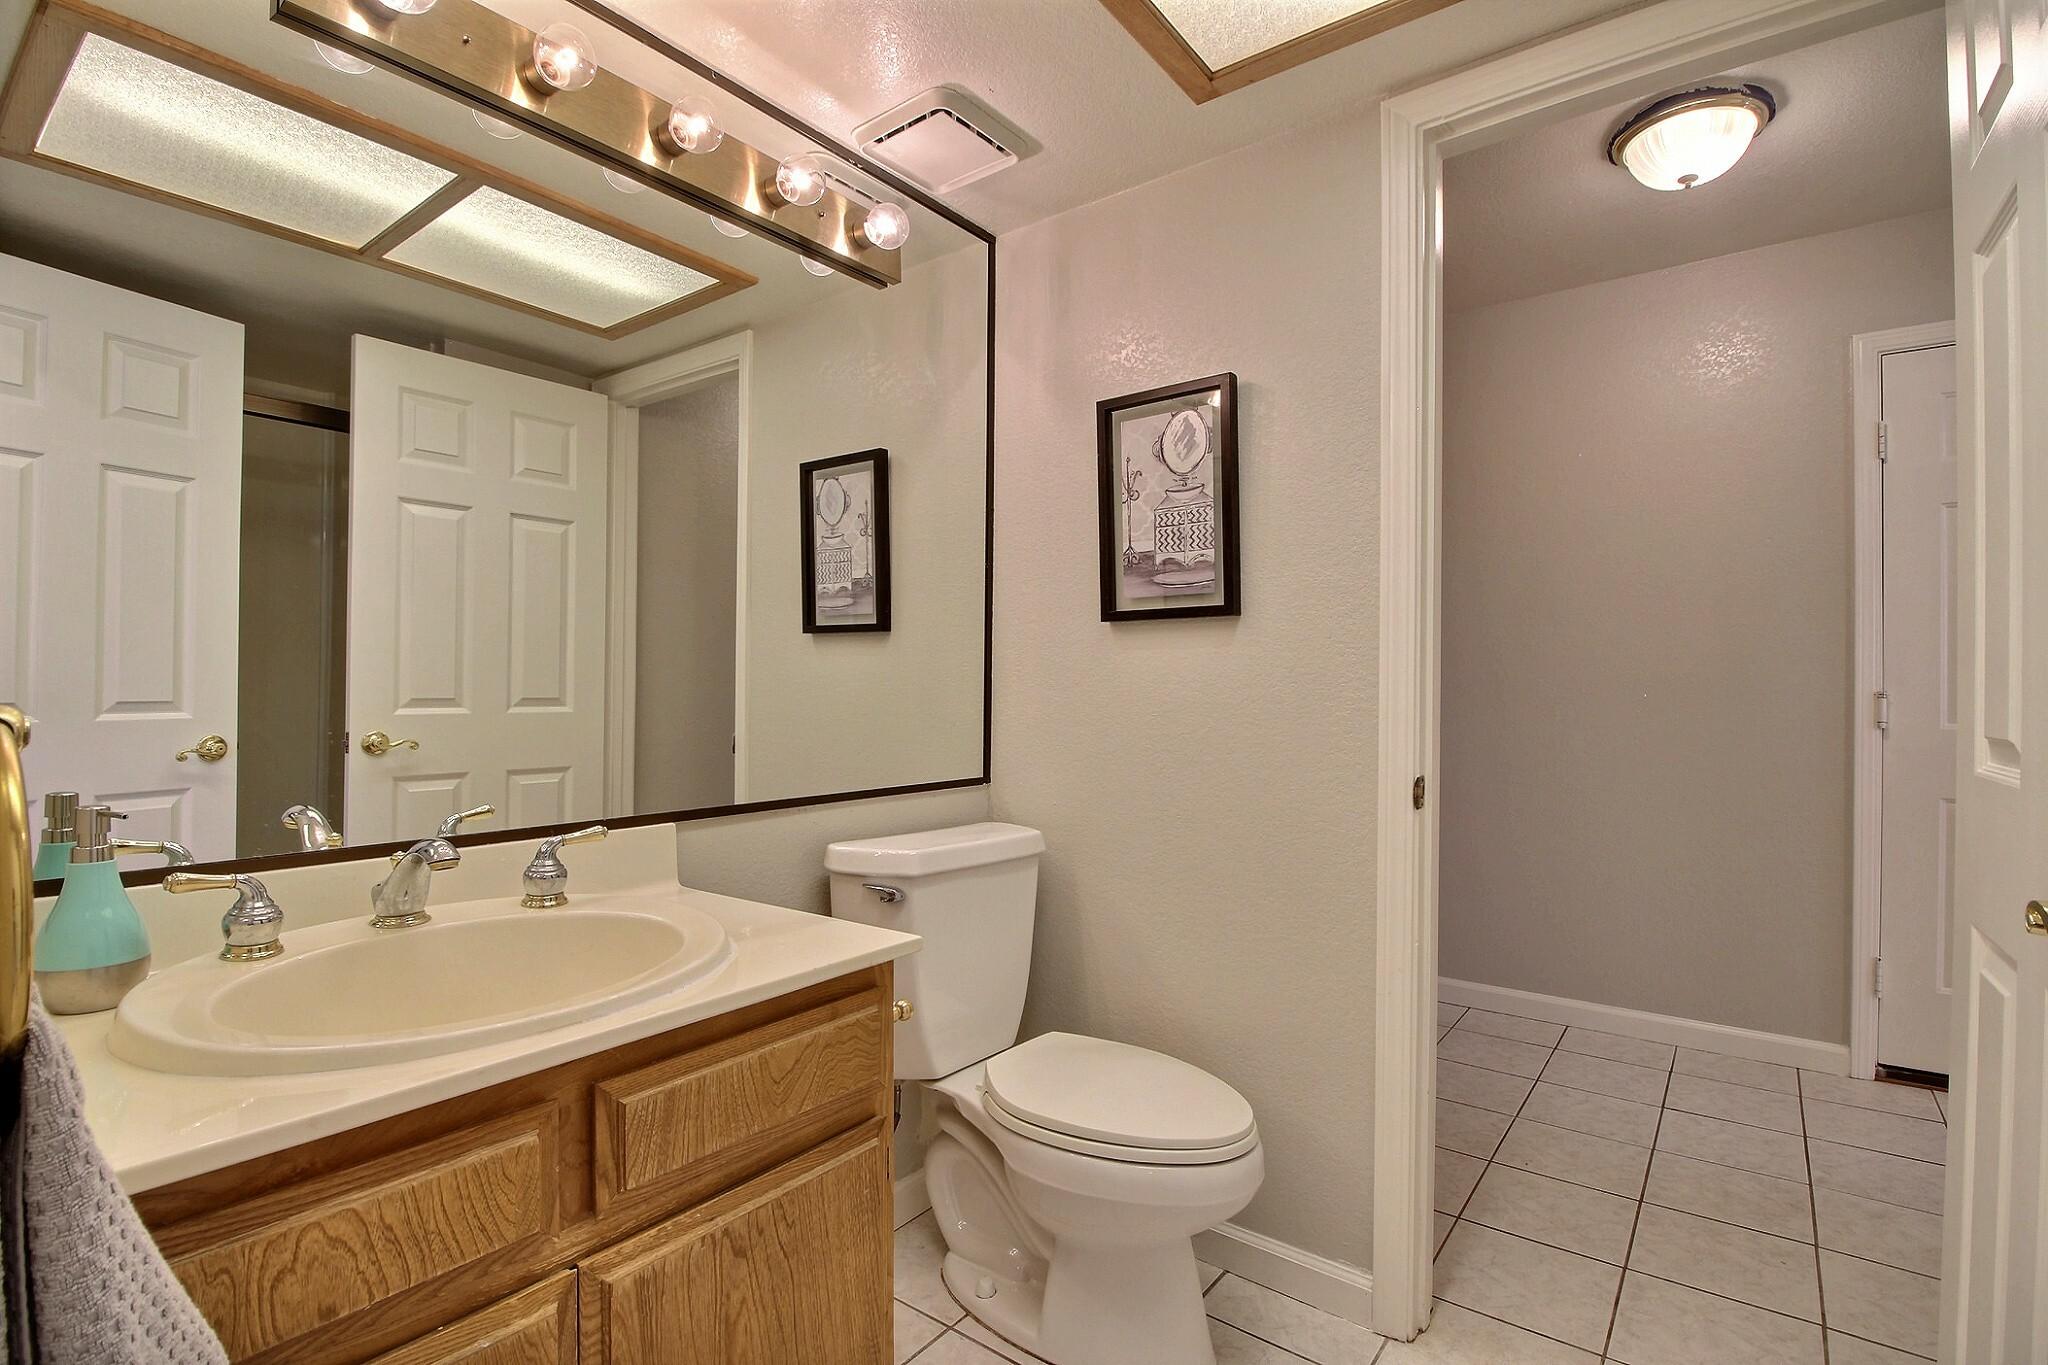 exposio_13_bathroom_1_02_2433_wildhorse_